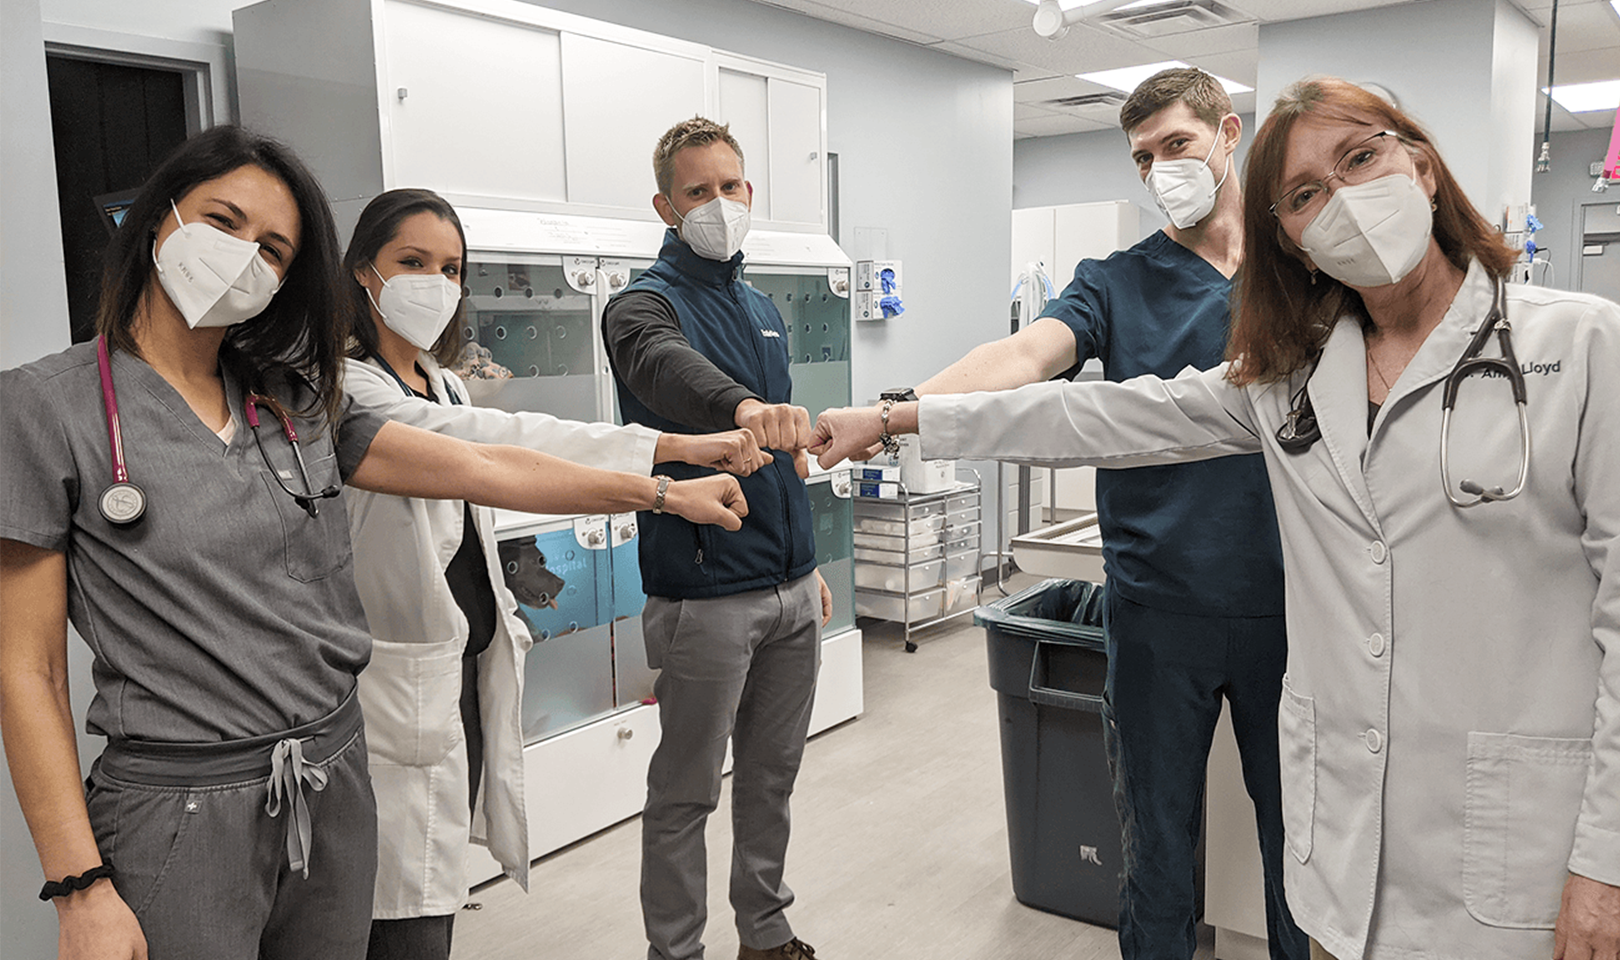 5 veterinarians working together